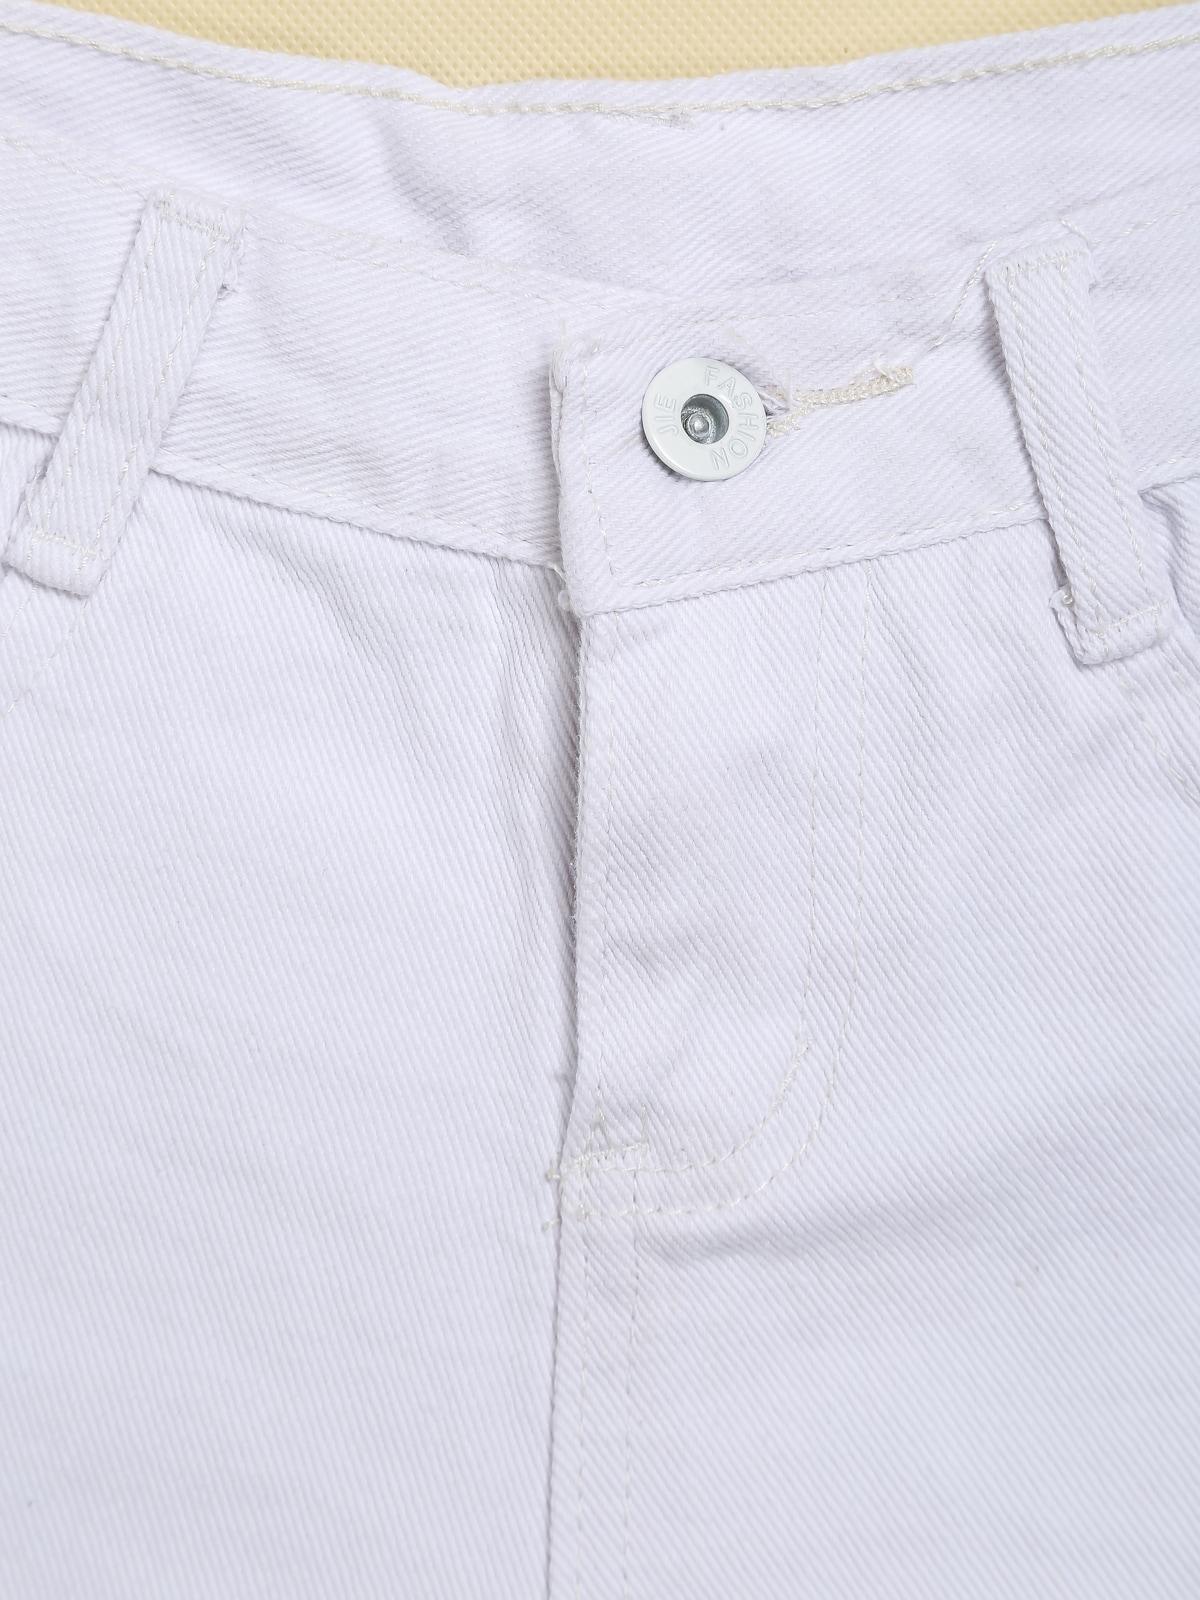 White Ripped Fringe Denim Shorts -SheIn(Sheinside)